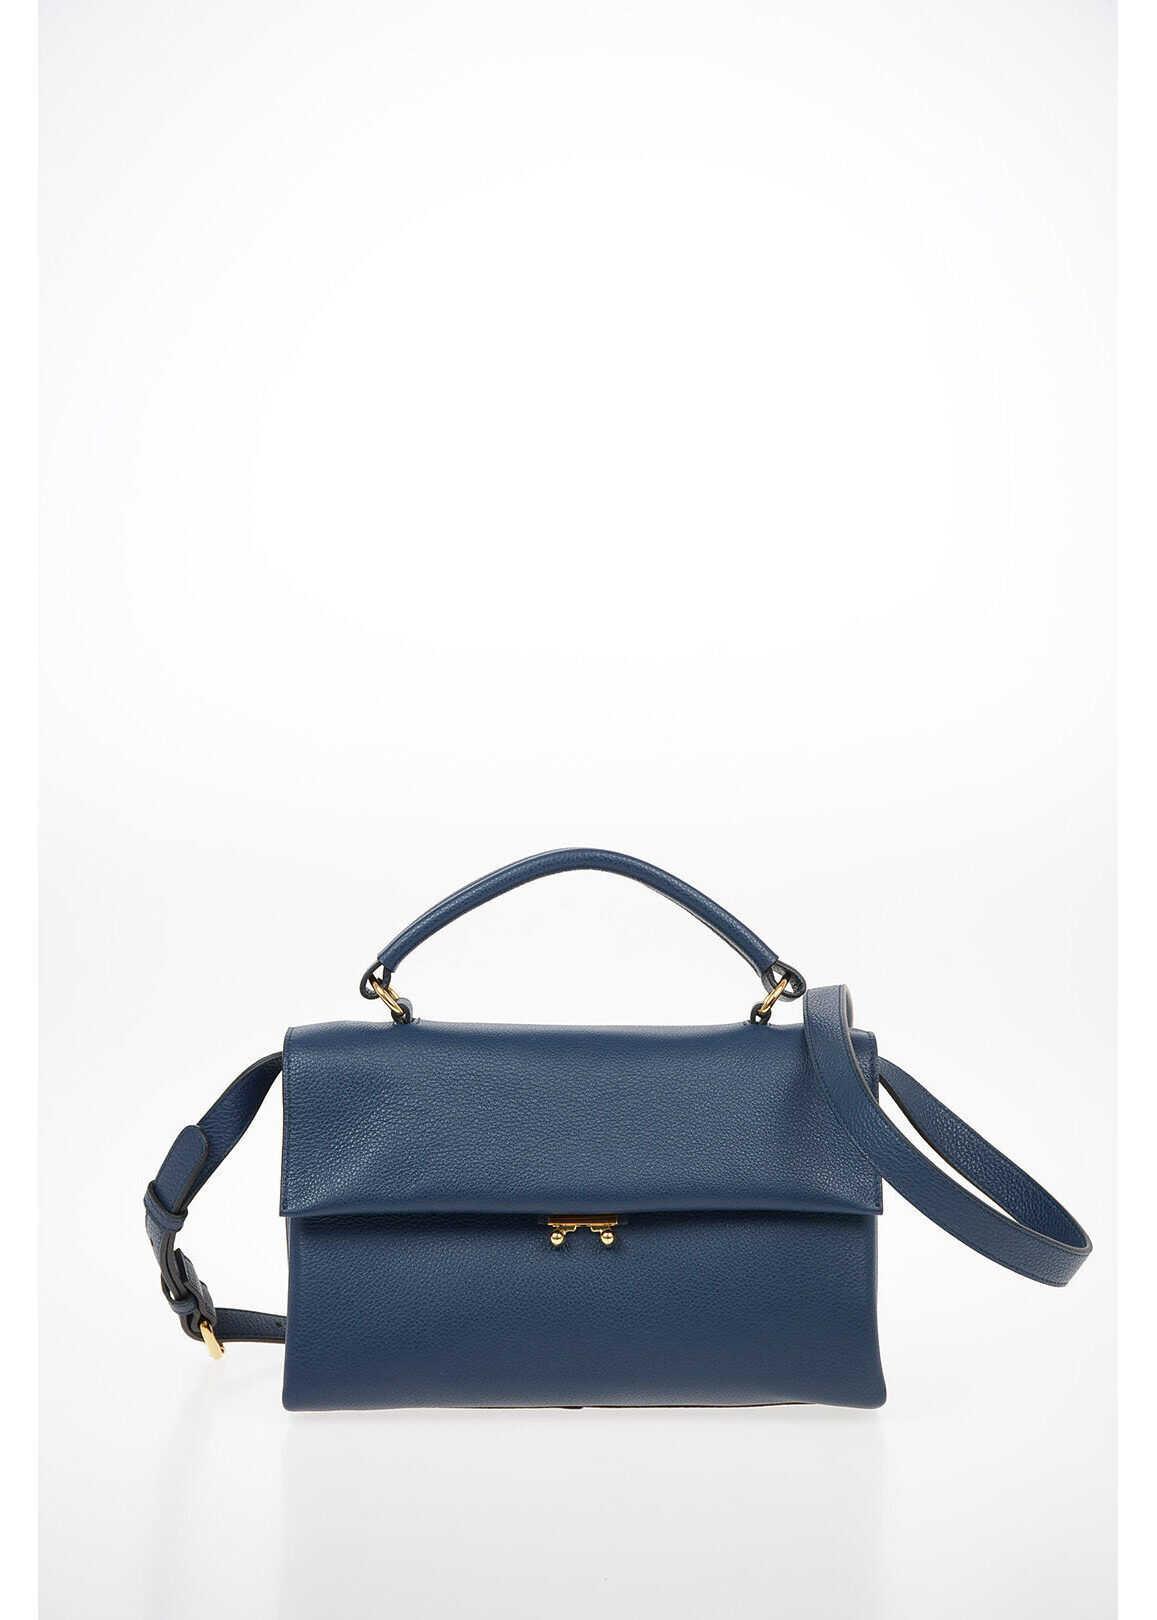 Marni Leather Shoulder Bag BLUE imagine b-mall.ro